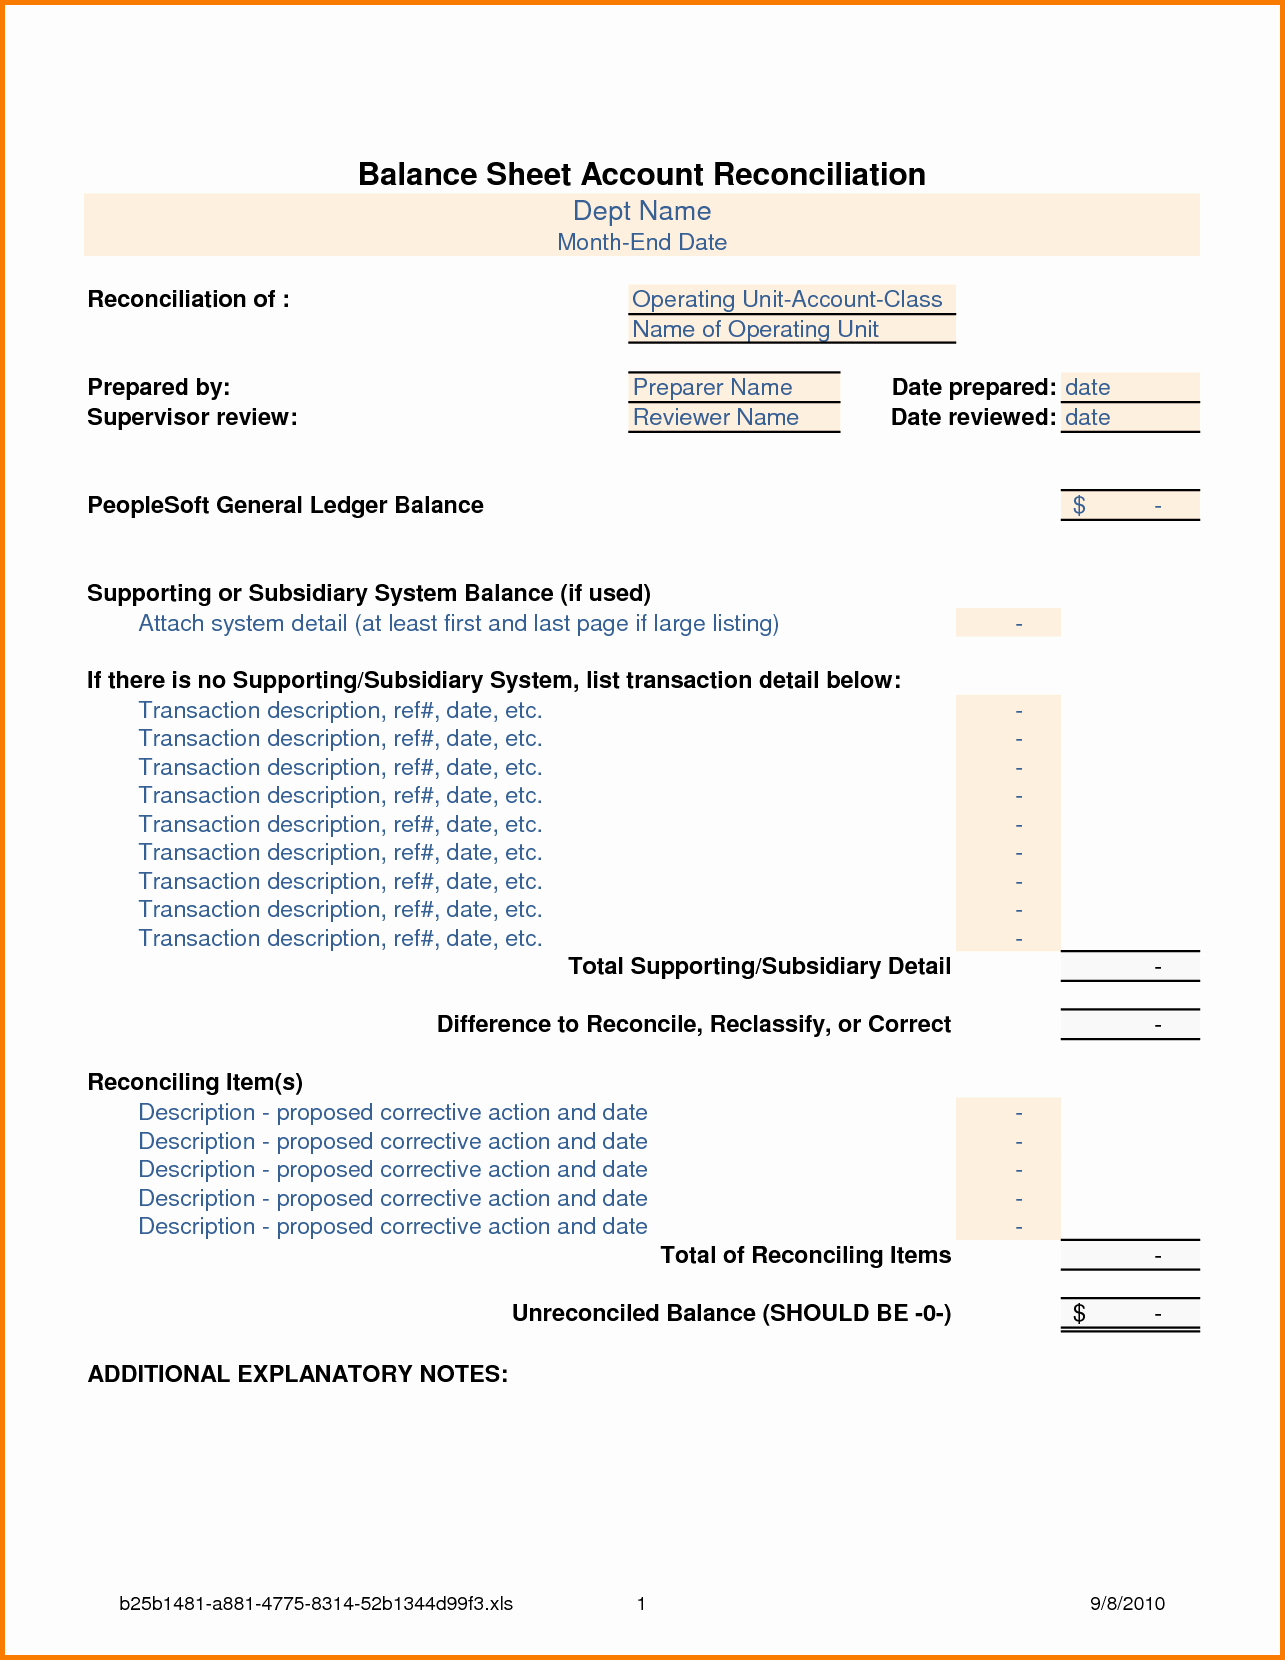 Balance Sheet Reconciliation Template Luxury Balance Sheet Reconciliation Template